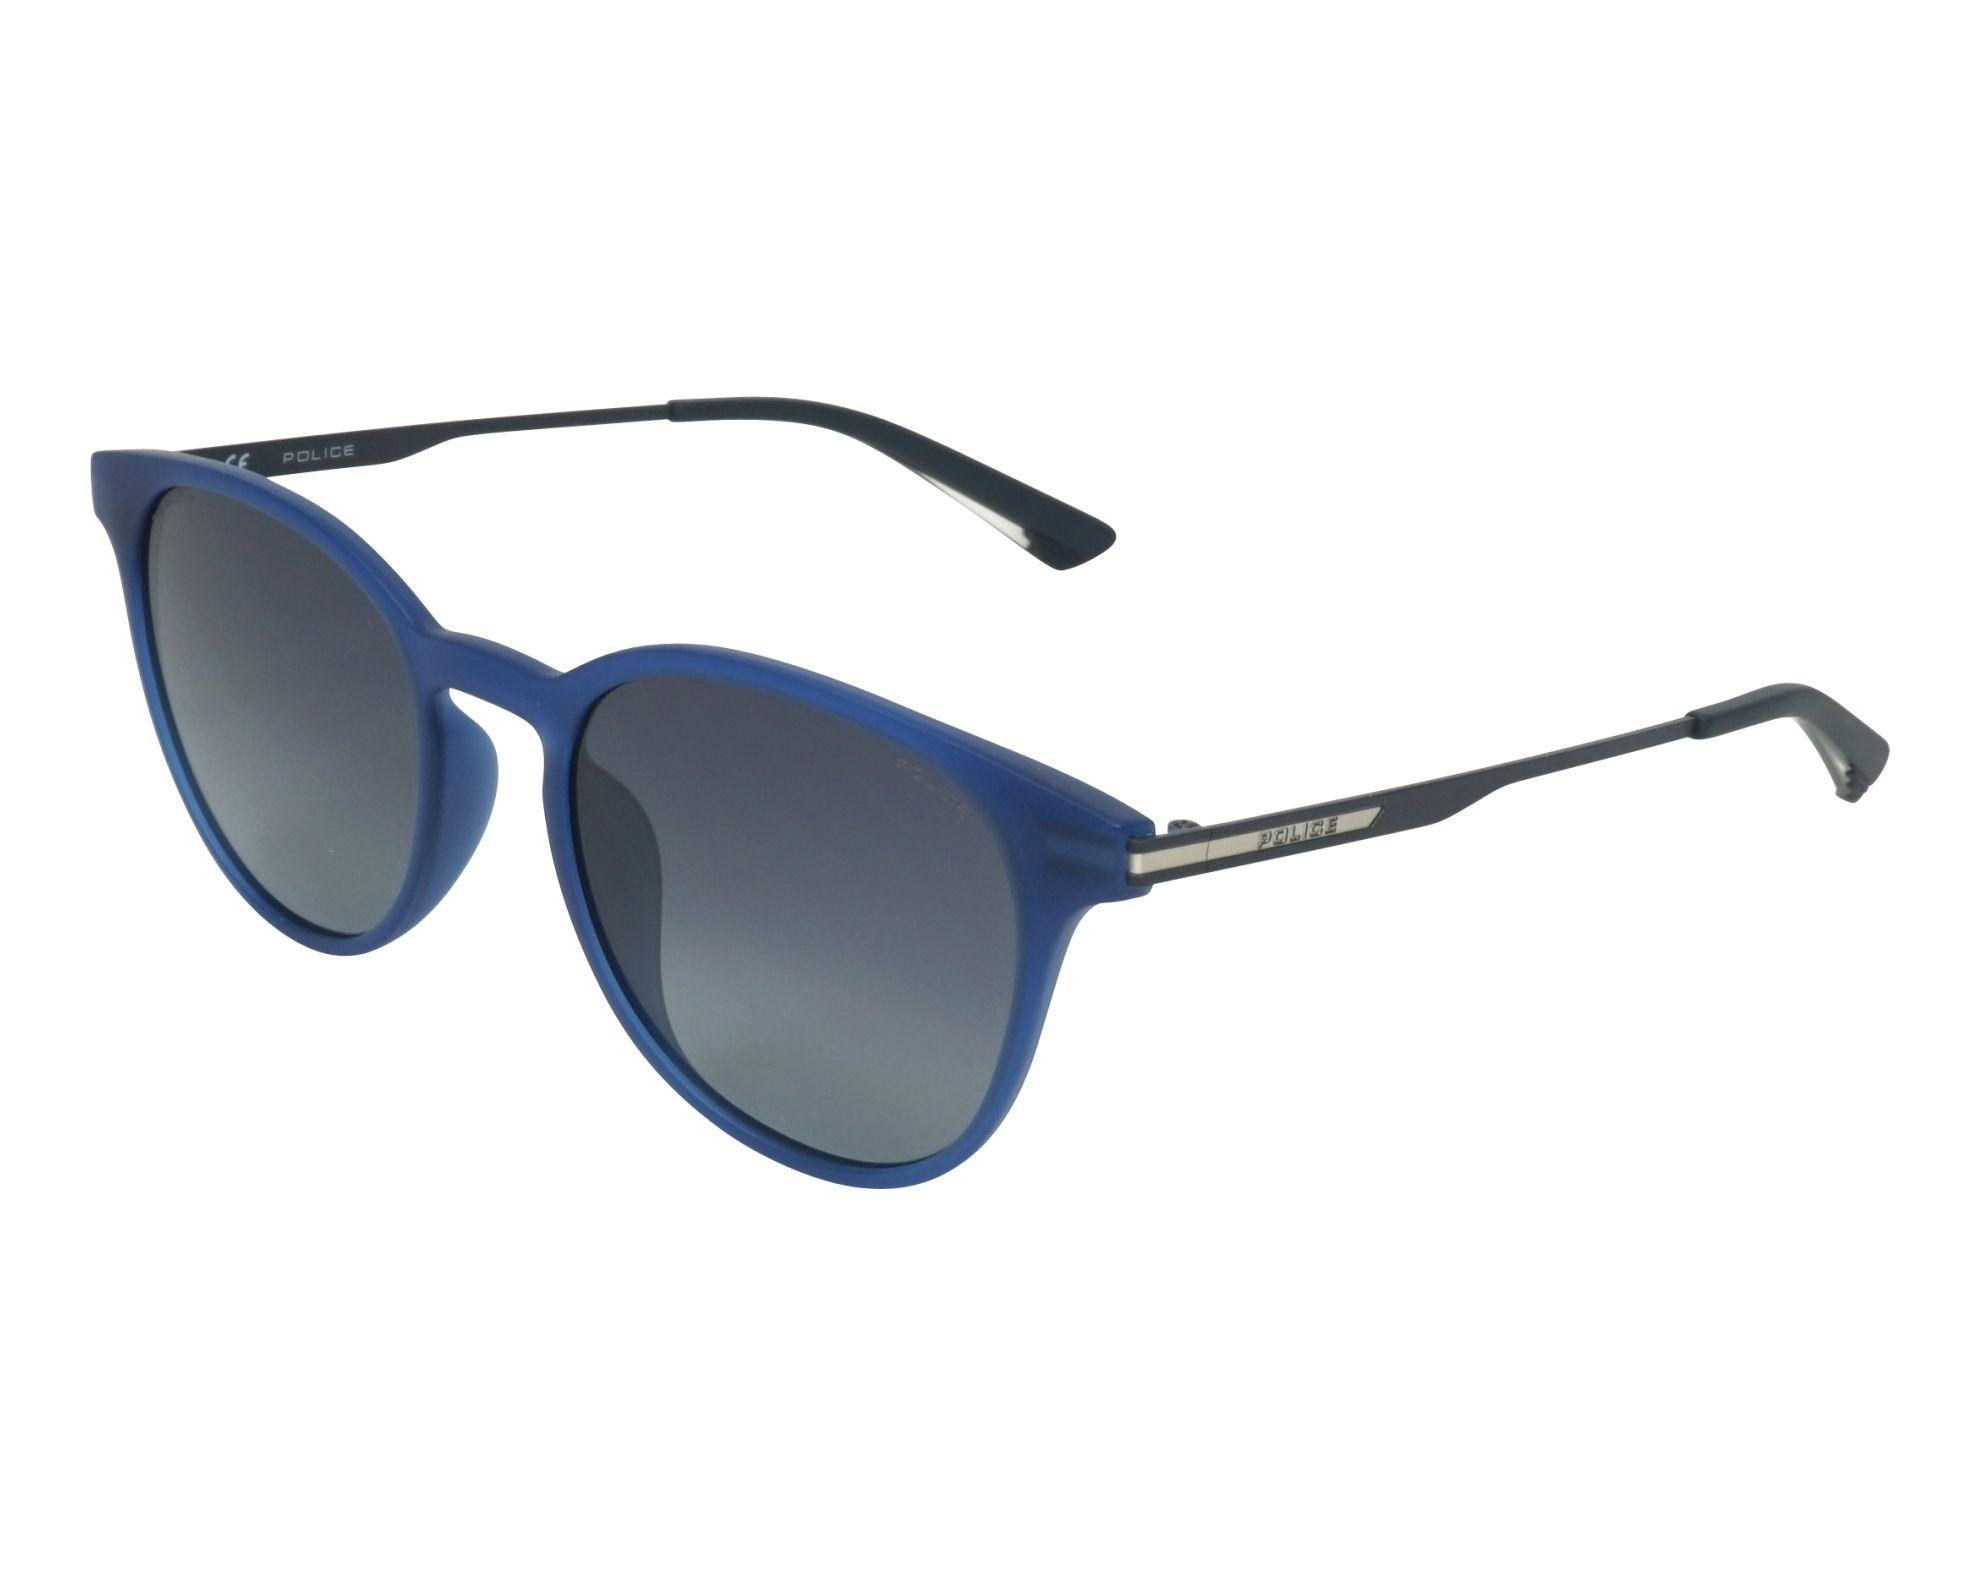 05b6ffc7de Gafas de sol Police SPL-718 TA5P 52-20 Azul vista de perfil